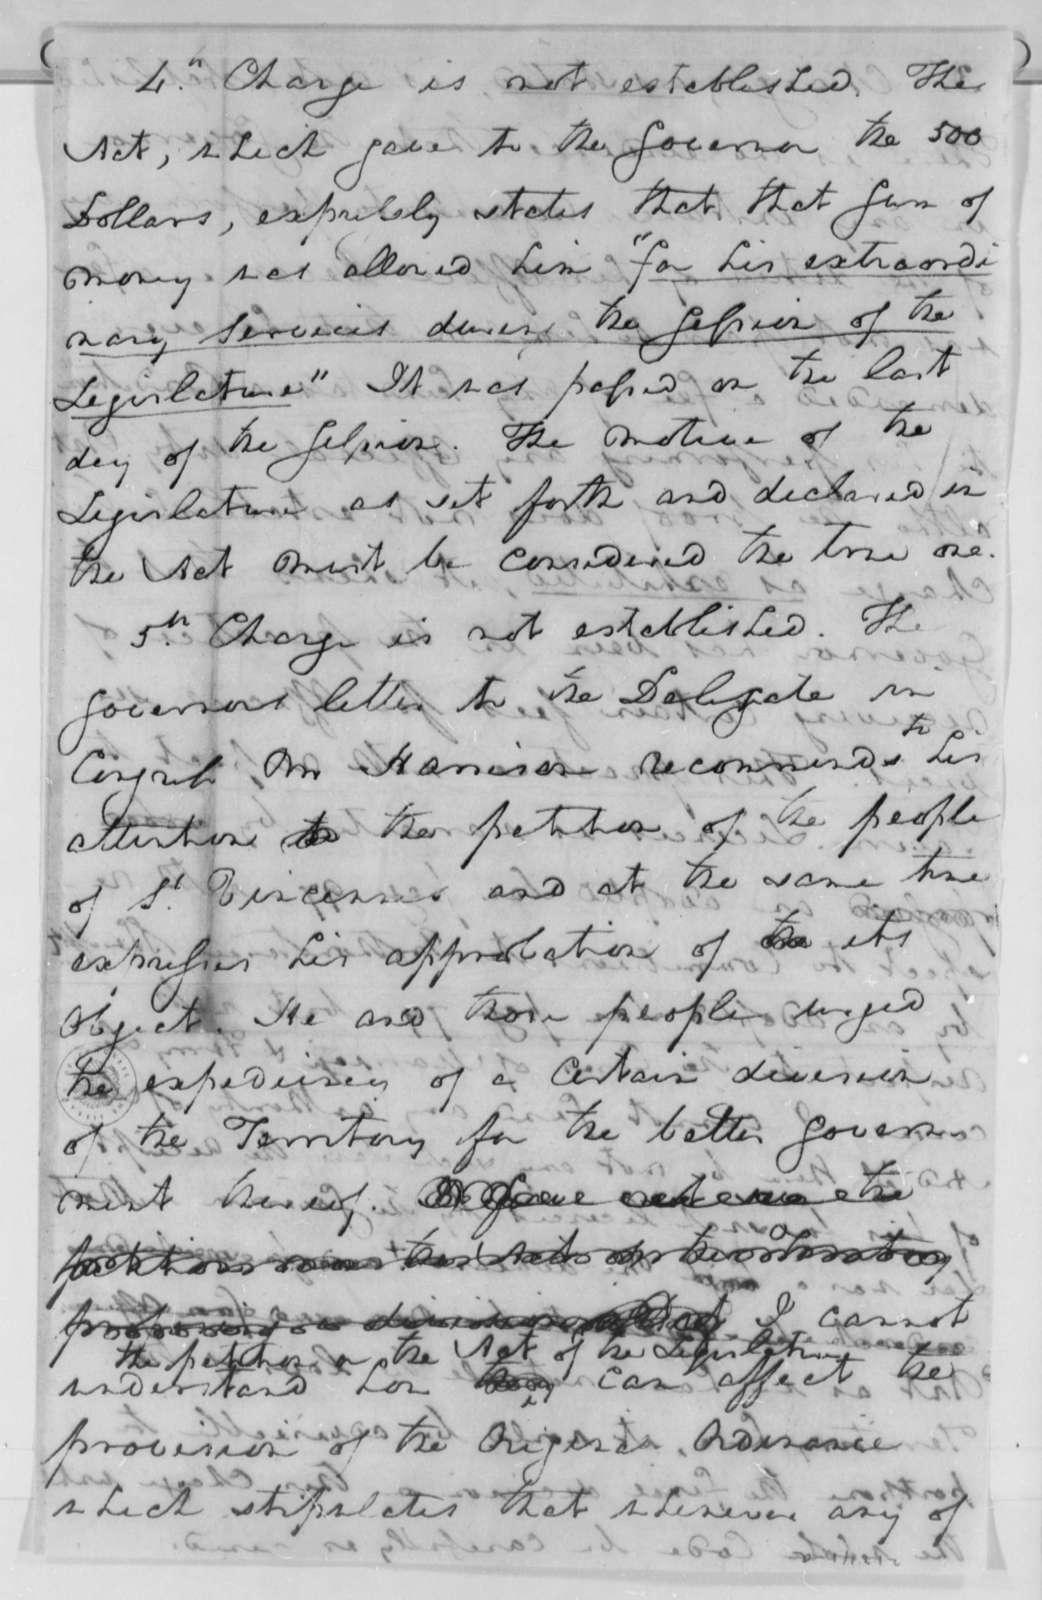 Robert Smith to Thomas Jefferson, June 15, 1802